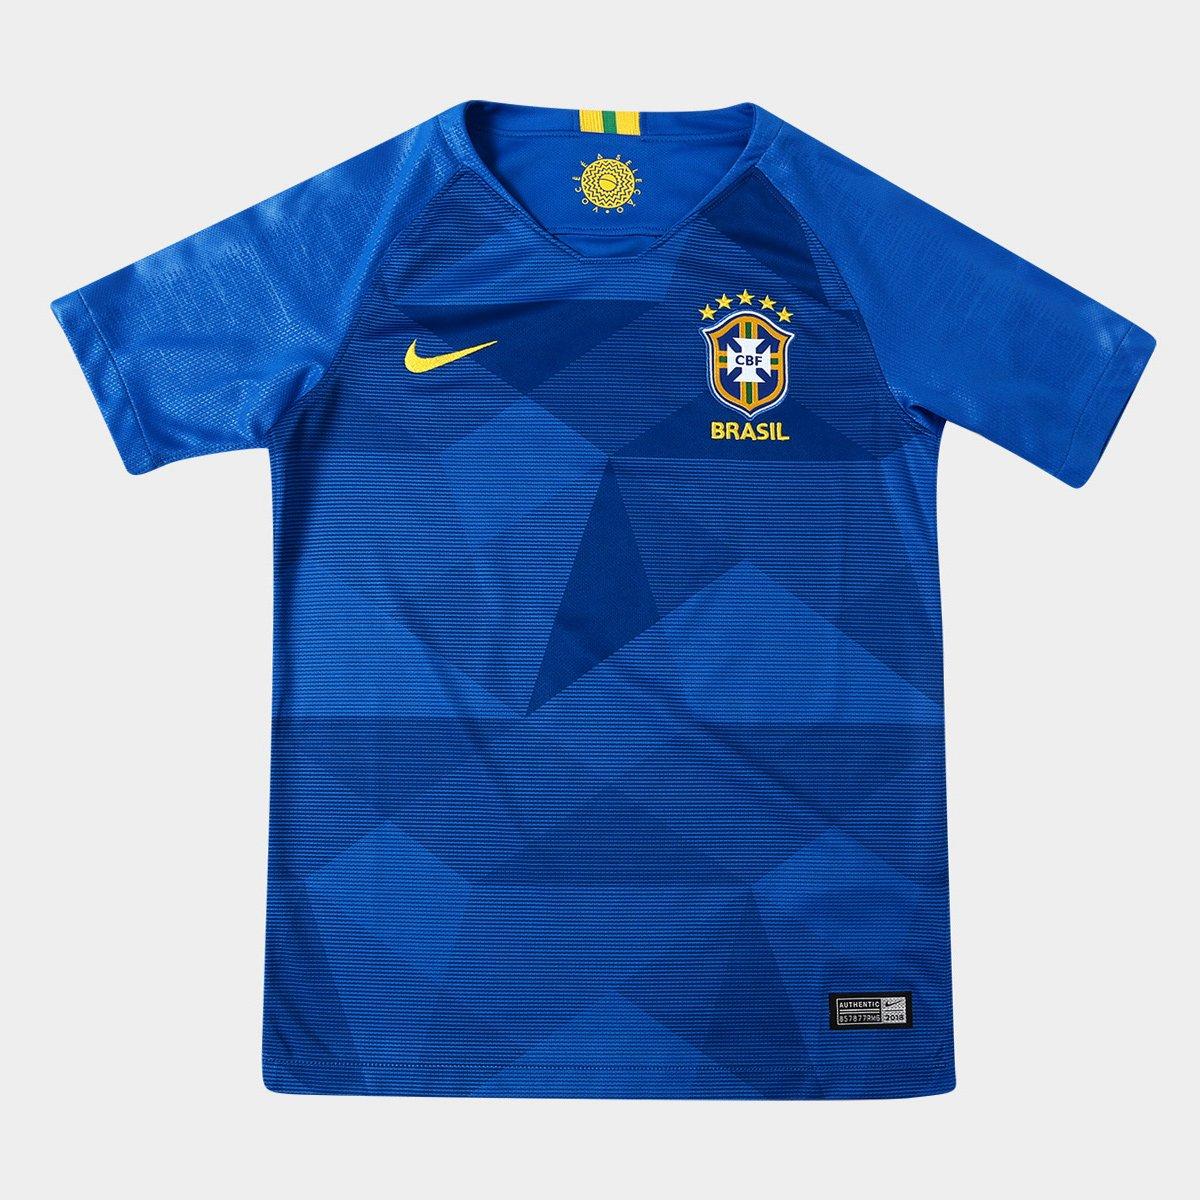 2f8708dcae ... Camisa Seleção Brasil Juvenil II 2018 nº 11 P. Coutinho - Torcedor Nike  ...